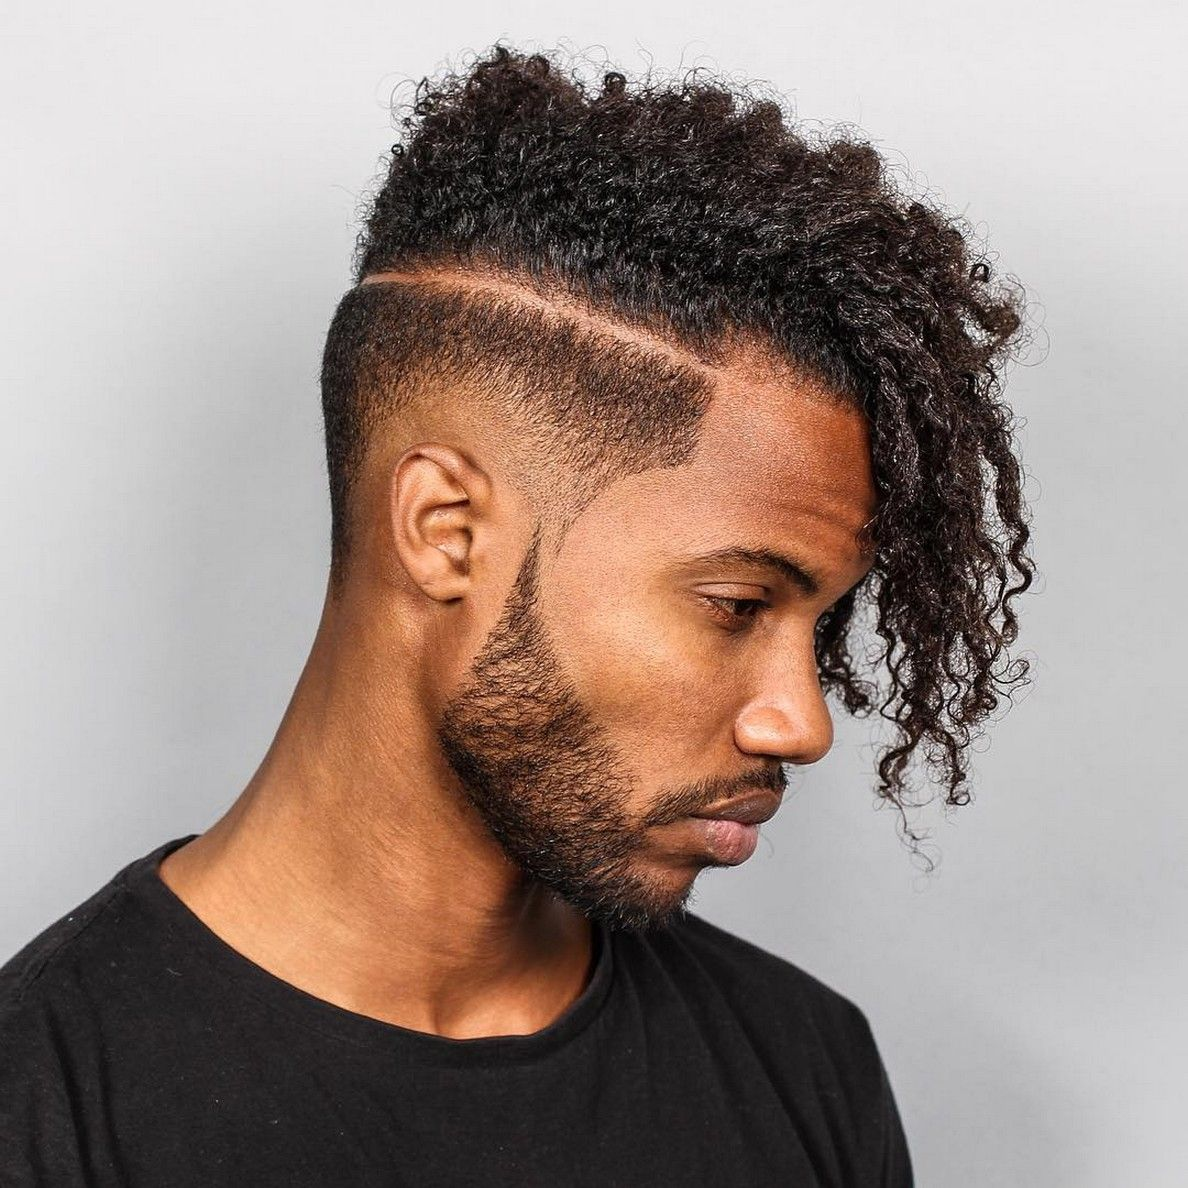 Elegant Side Burn 21 Shape Up Hairstyles #mensshapeuphaircuts  #mensshapeuphairstyles #ShapeUpHaircutstyles #ShapeUpwithShortHairHaircut #  ...